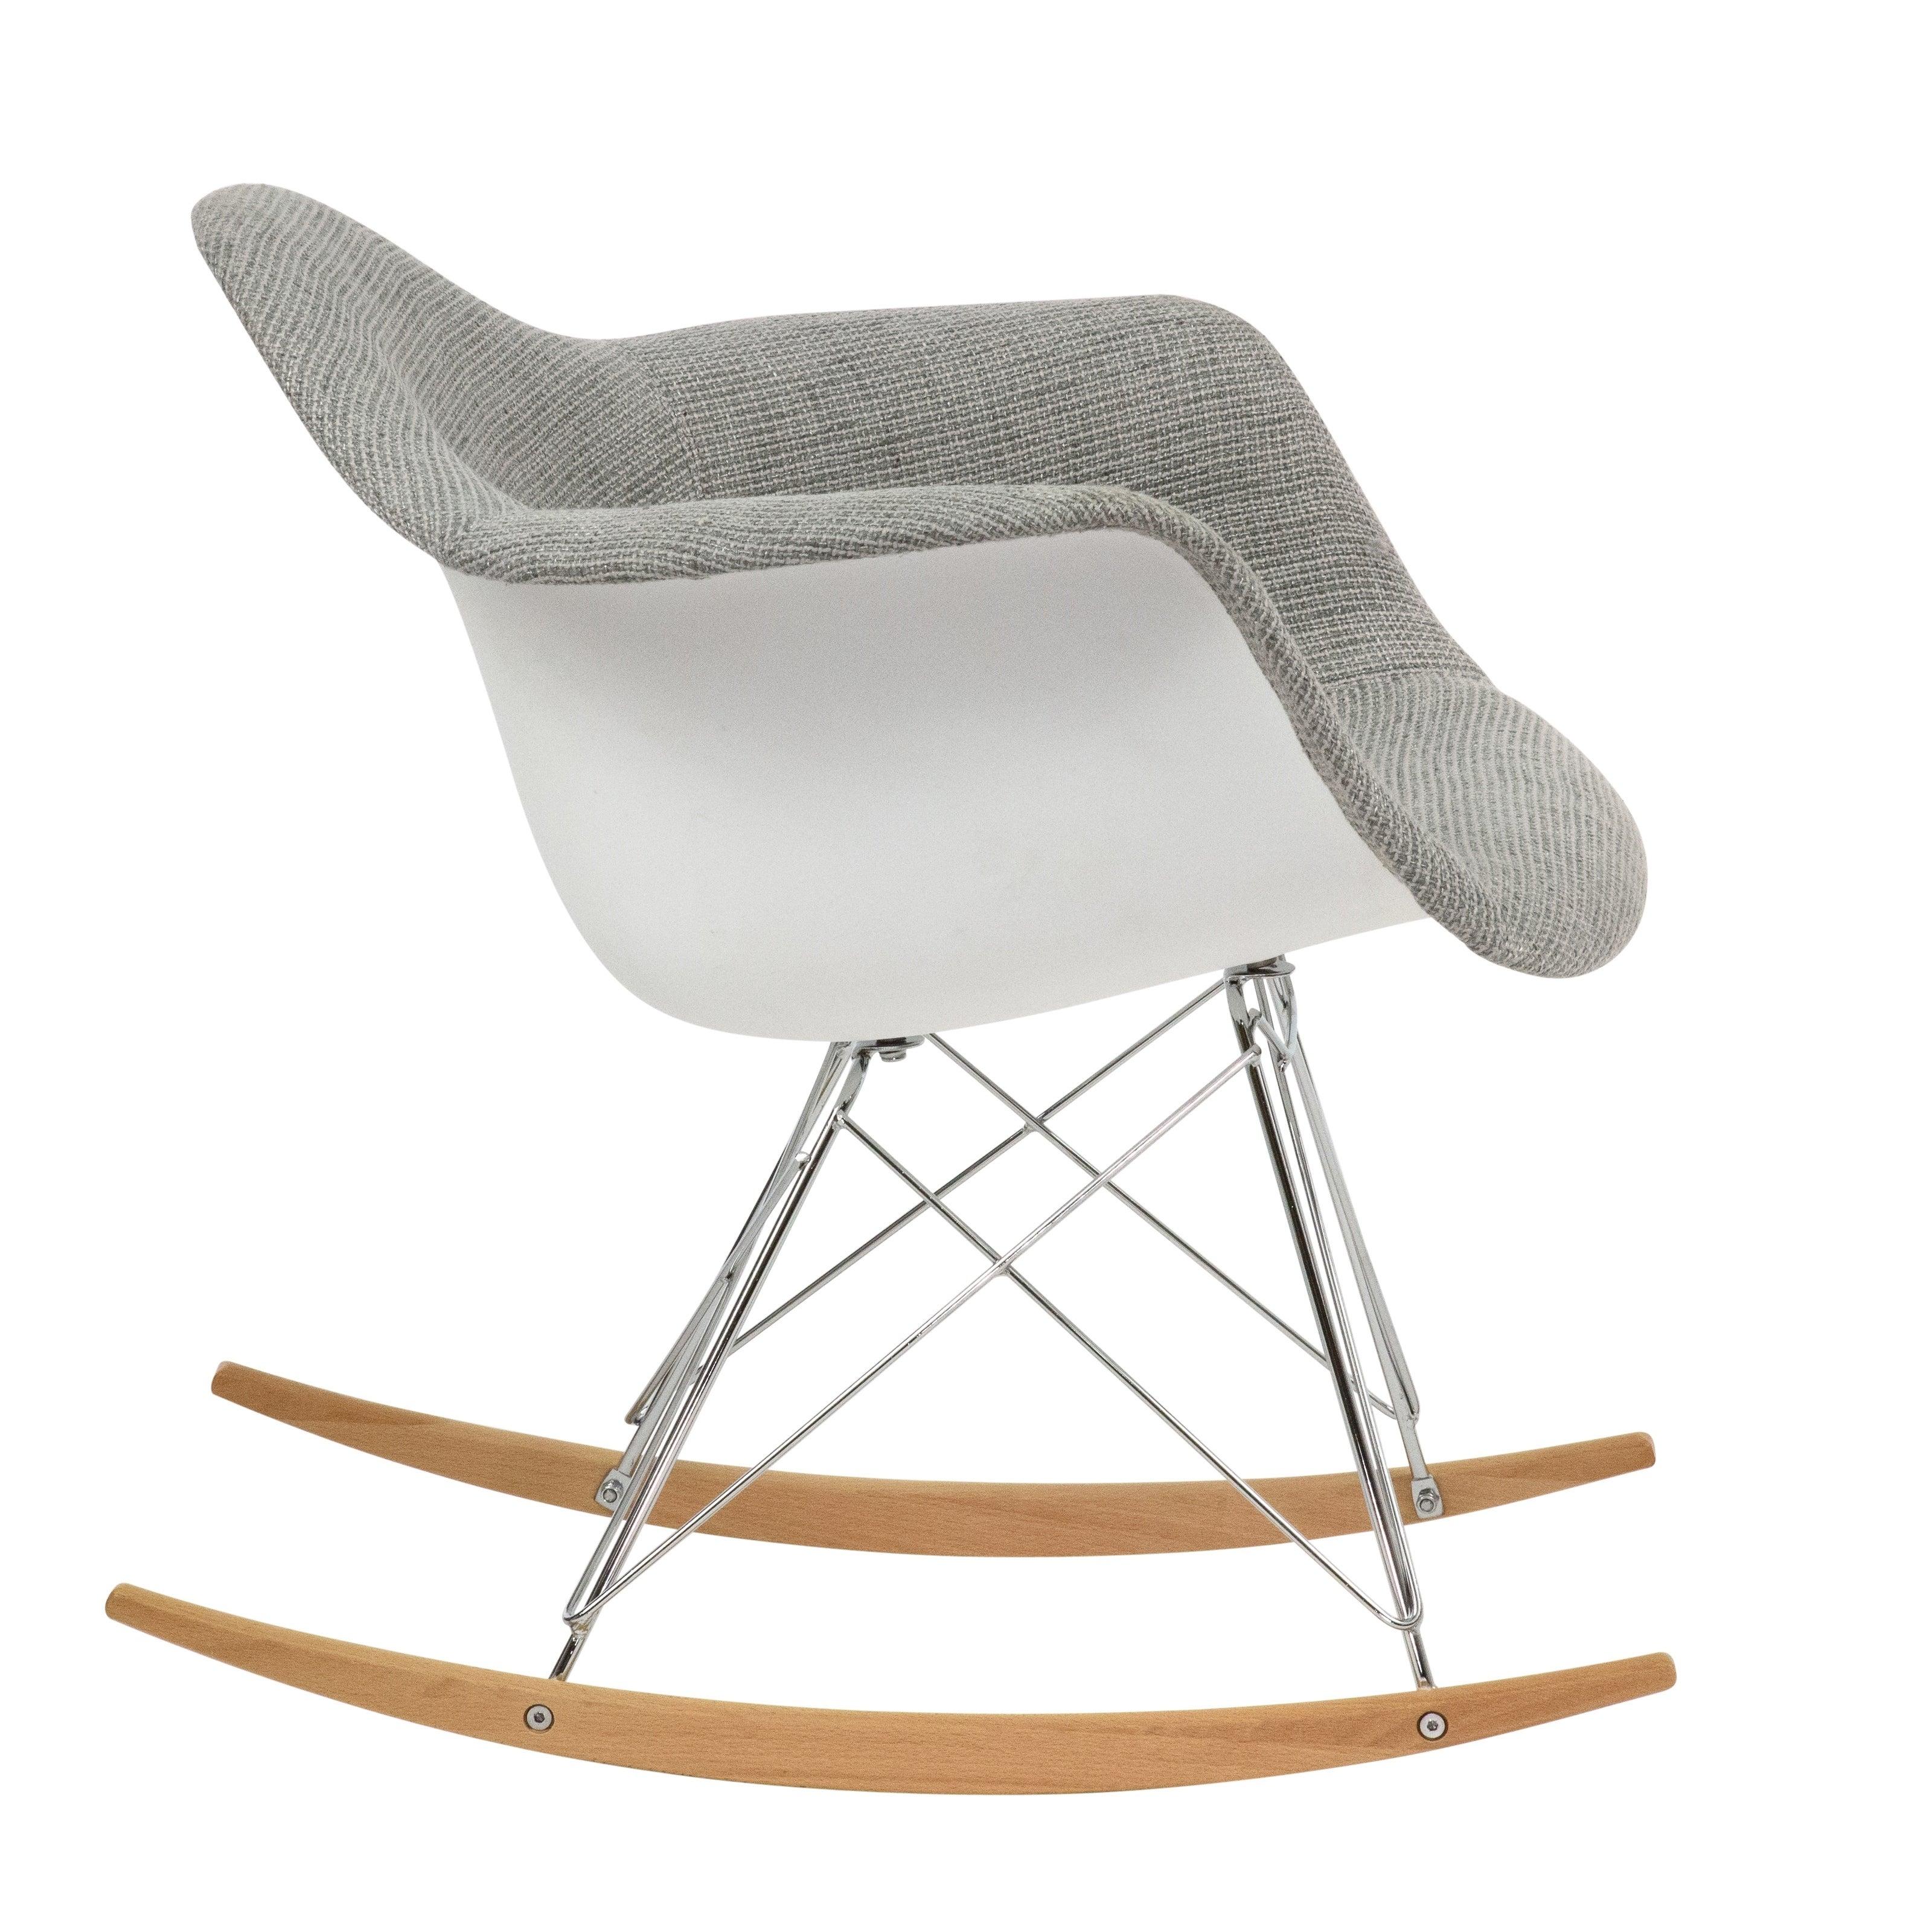 Leisuremod Wilson Twill Fabric Grey Rocking Chair W/ Eiffel Legs For Twill Fabric Multi Rocking Chairs With Eiffel Legs (View 5 of 20)